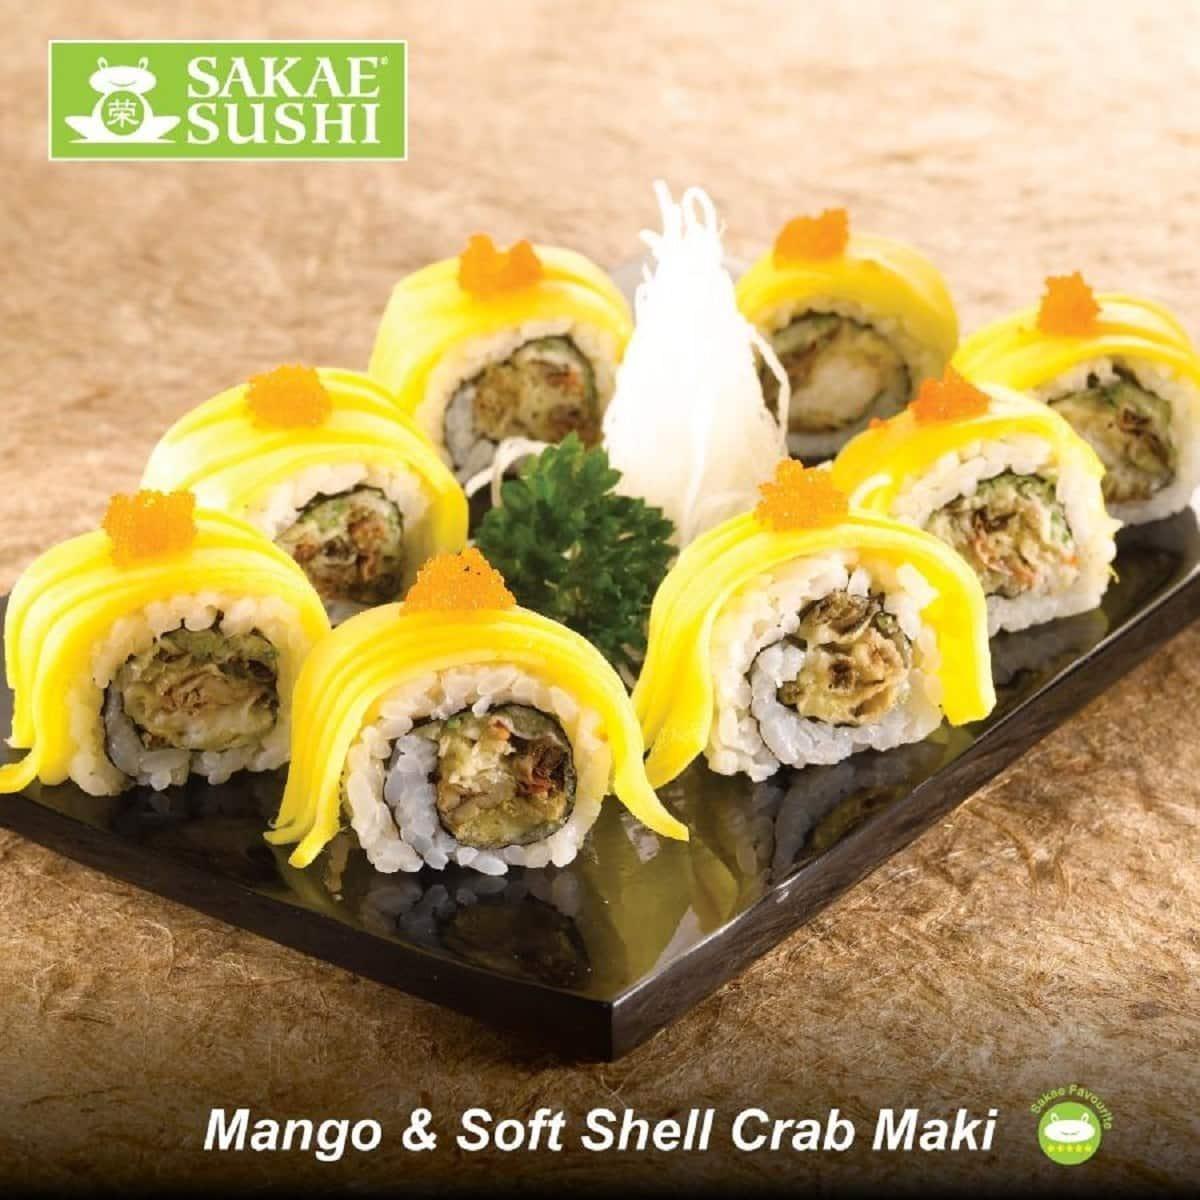 Sakae Sushi Japanese Seafood Restaurant Private Party In Bangsar Bangsar Village 1 2 Klang Valley Openrice Malaysia